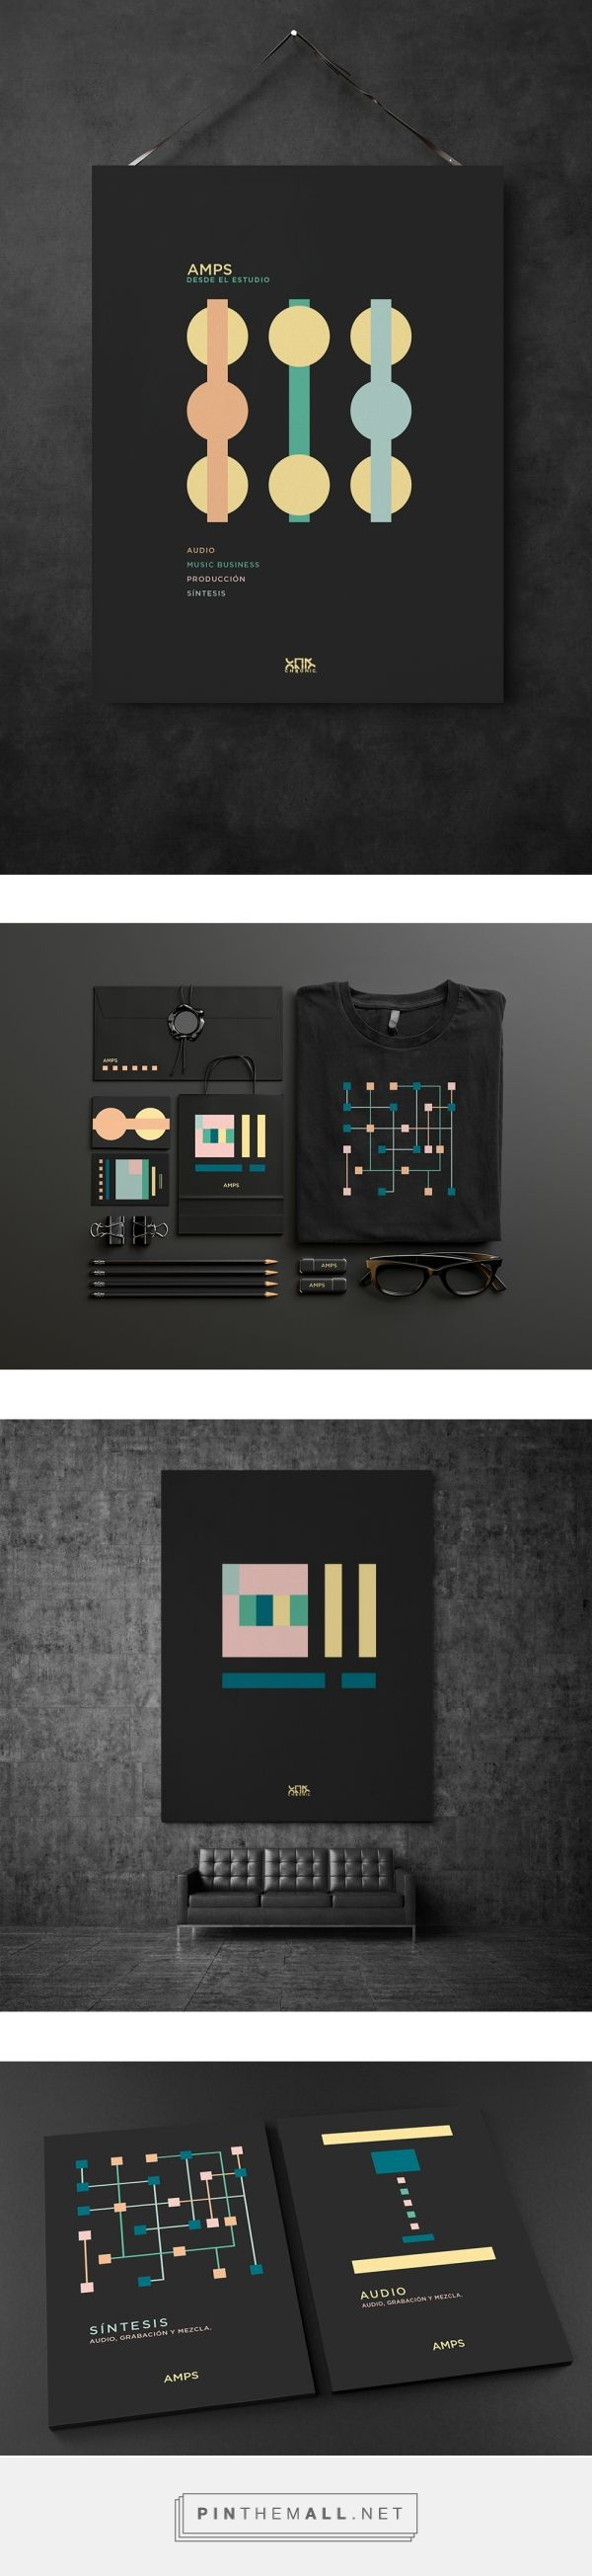 AMPS on Behance    Fivestar Branding – Design and Branding Agency & Inspiration Gallery